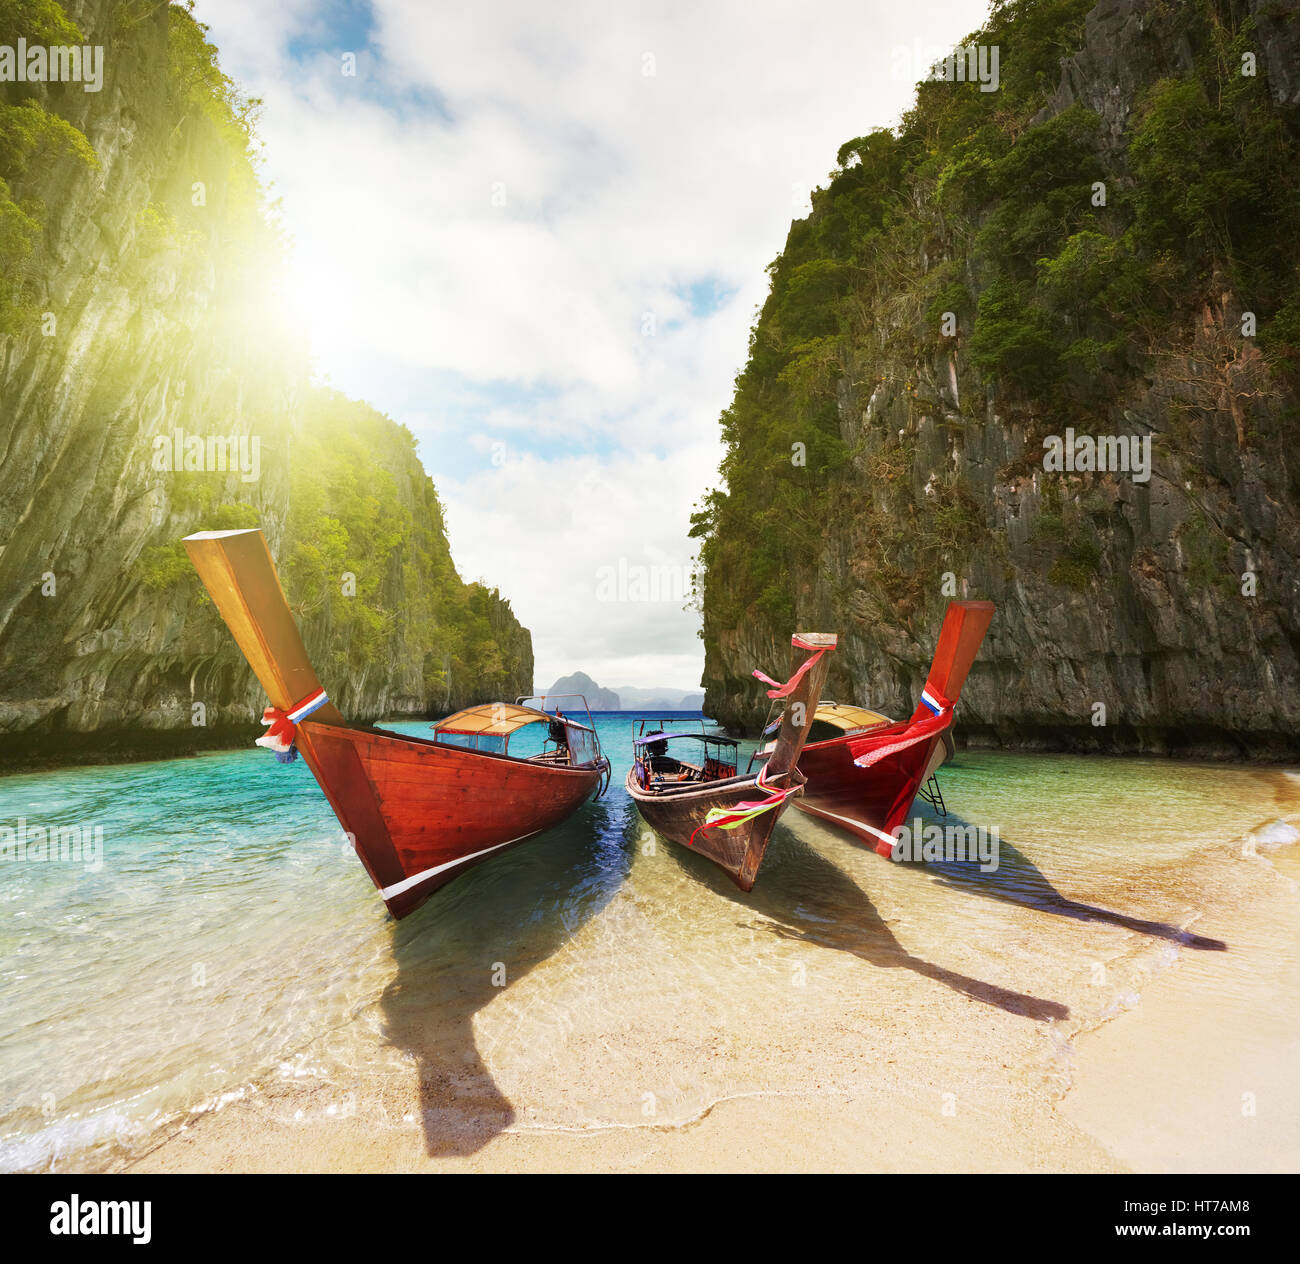 Boats on the beach inside small laguna - Stock Image